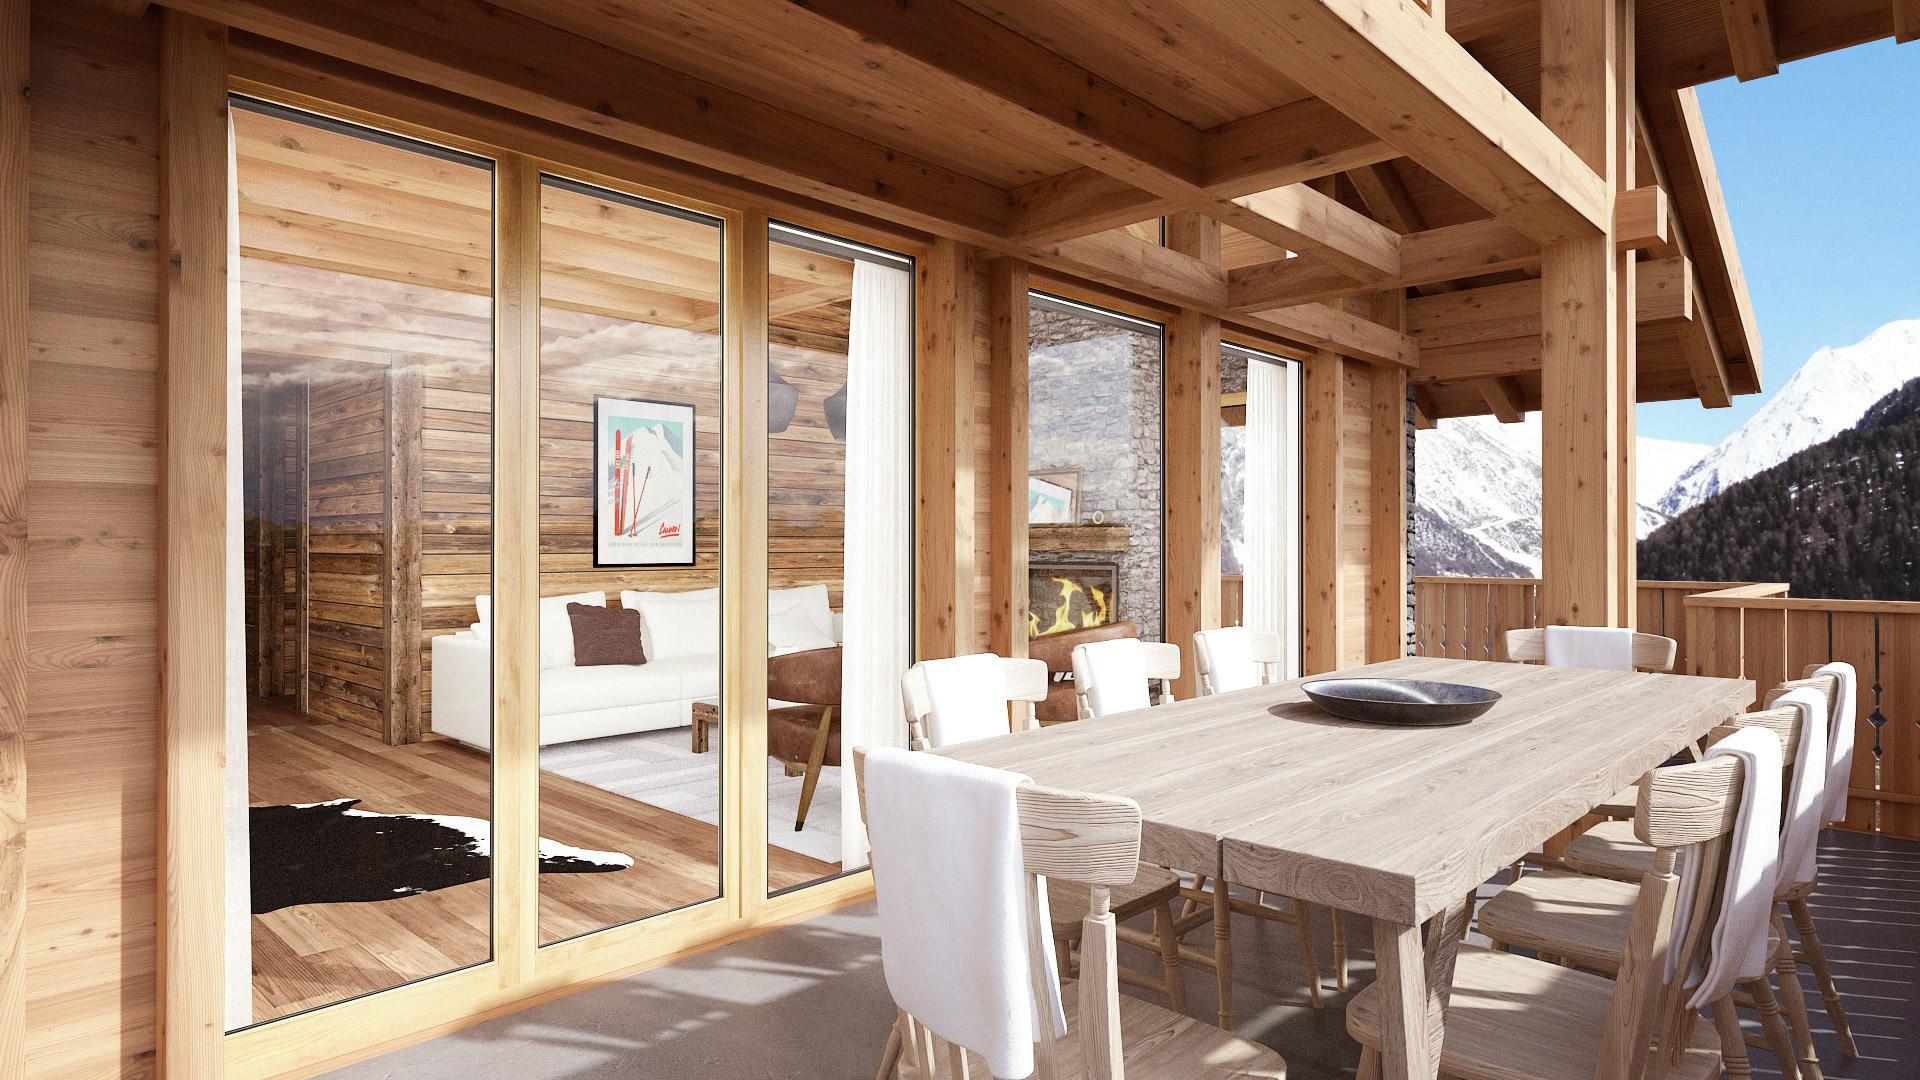 Hohnegg Lodge Chalet, Switzerland